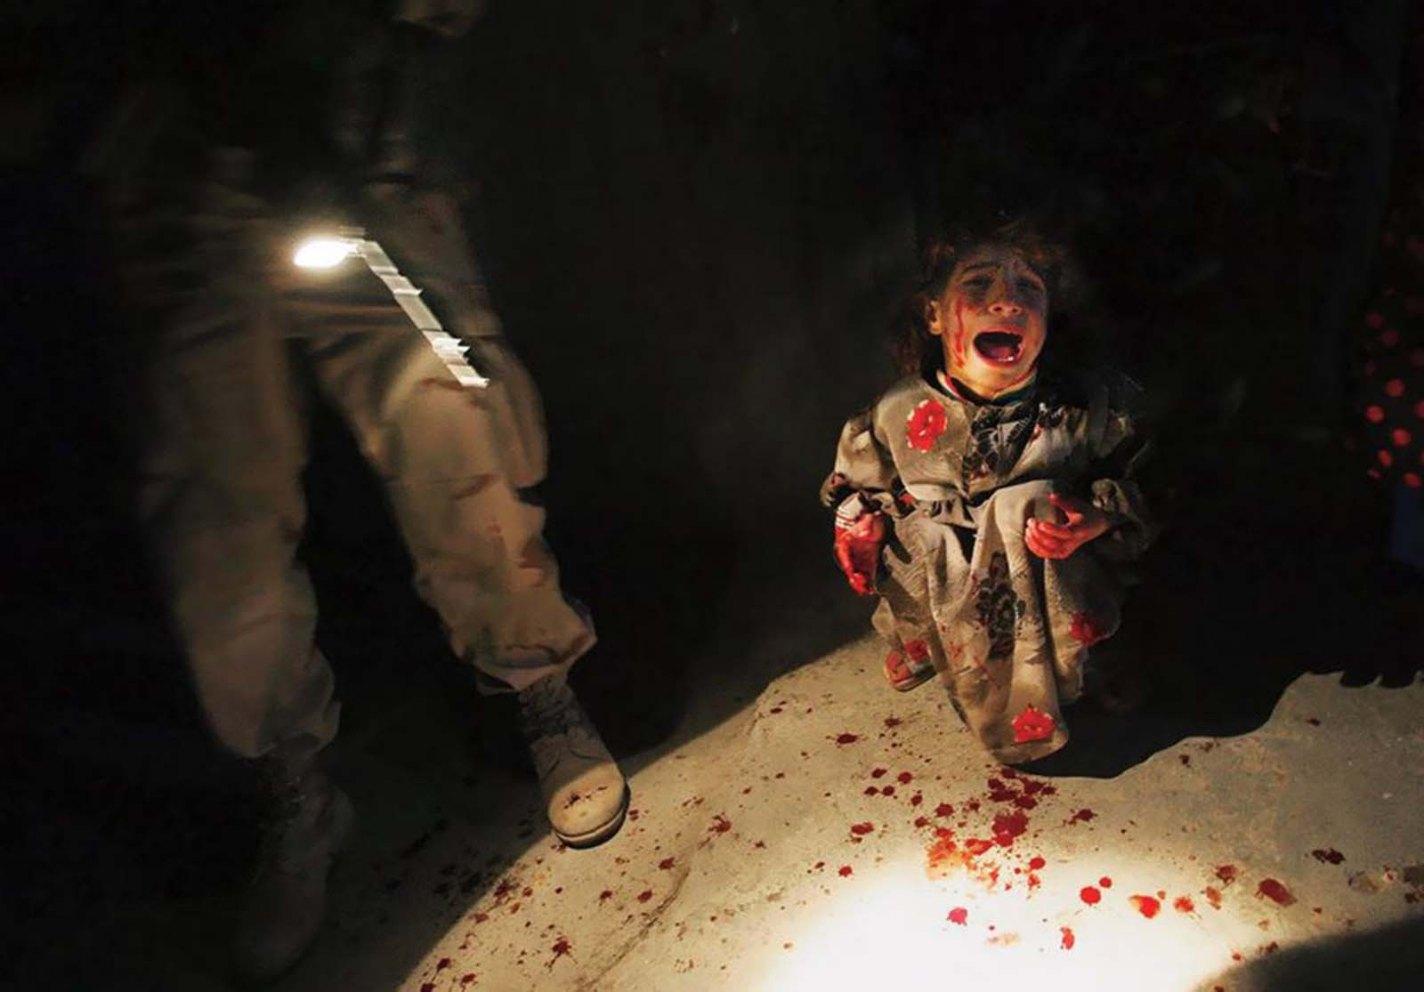 Iraqi Girl at Checkpoint, Chris Hondros, 2005